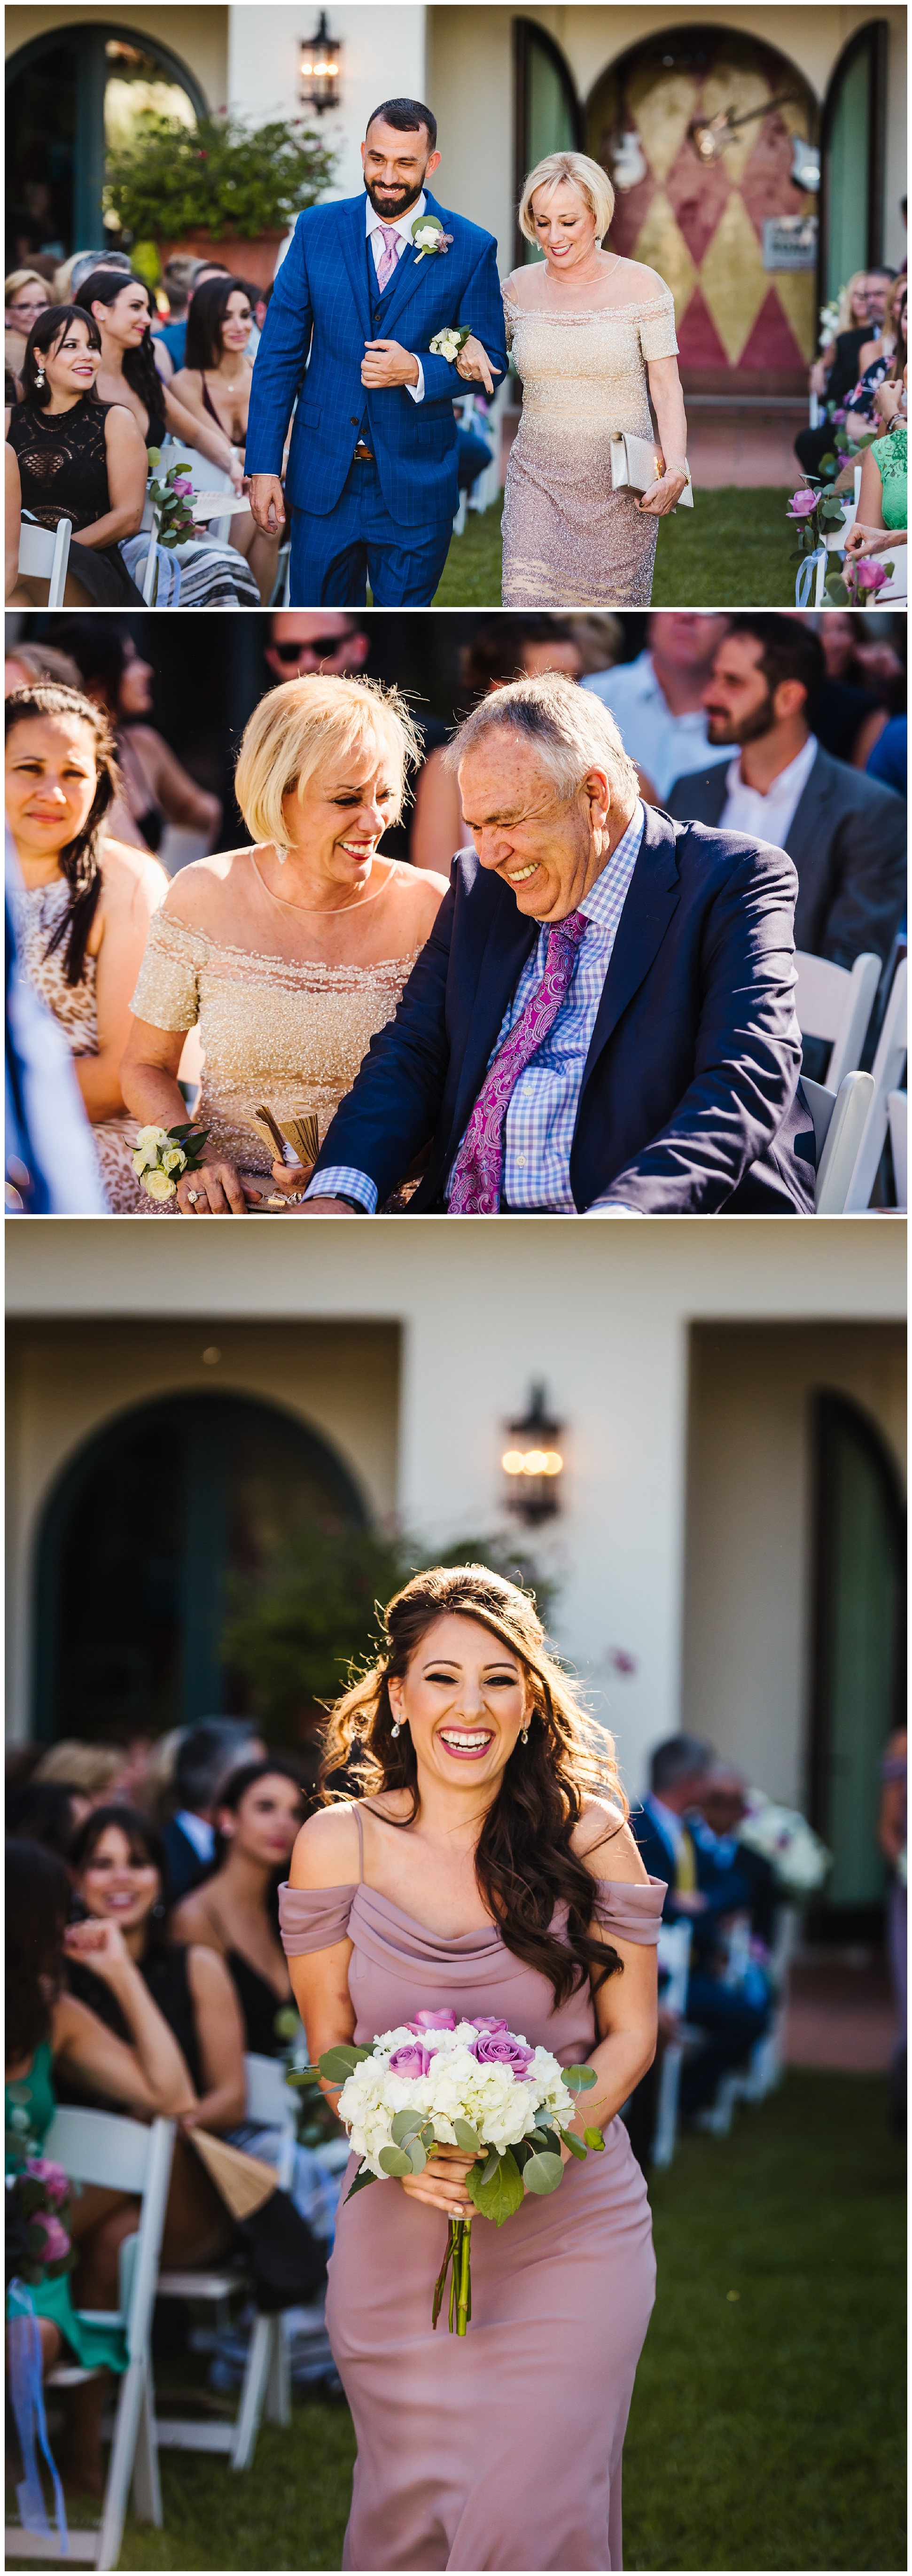 Tampa-luxury-wedding-photographer-mision-lago-private-estate_0024.jpg